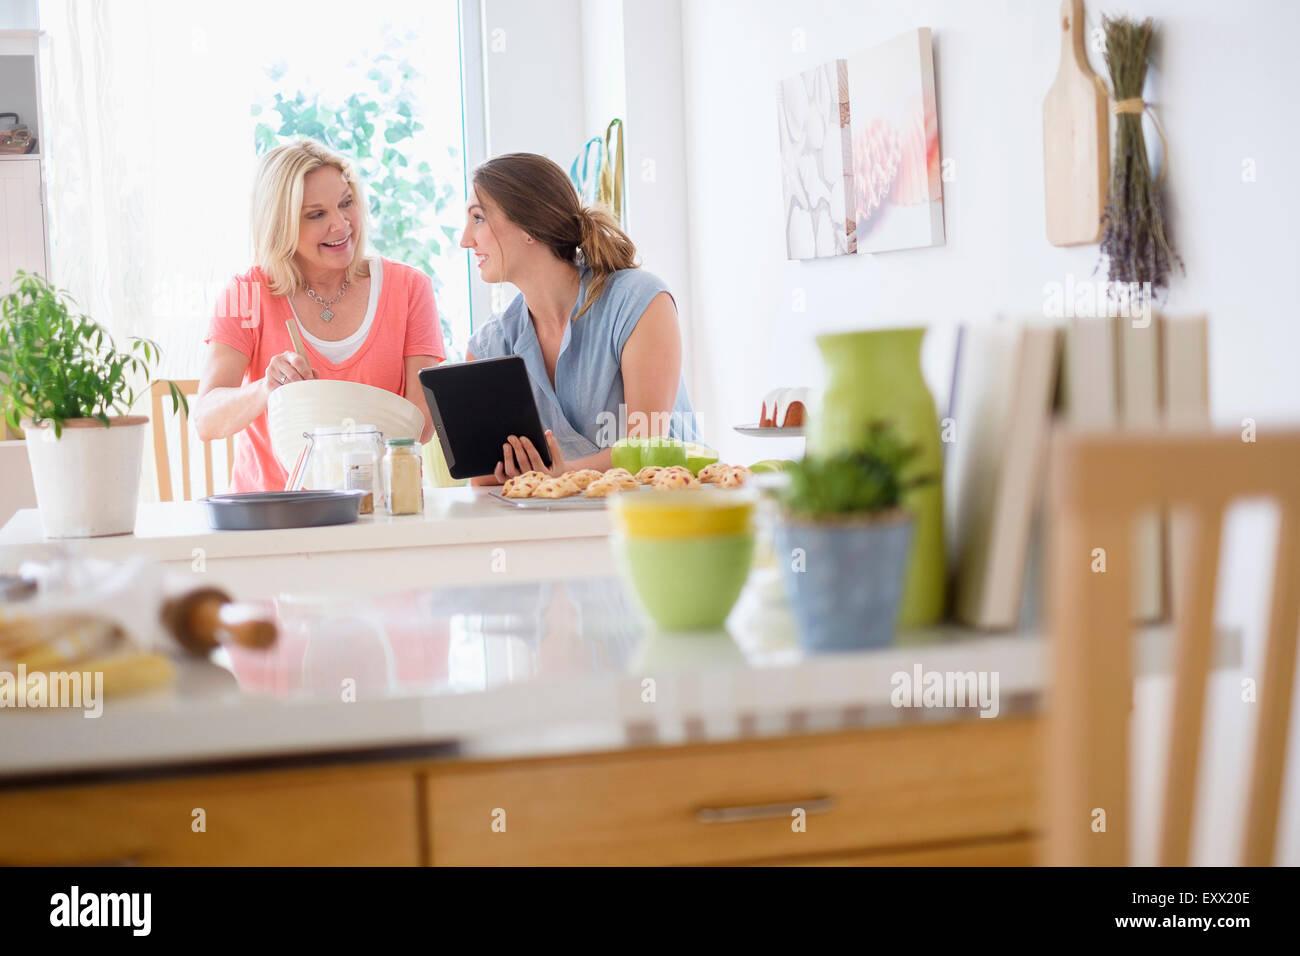 Mère avec sa fille adulte baking in kitchen Photo Stock